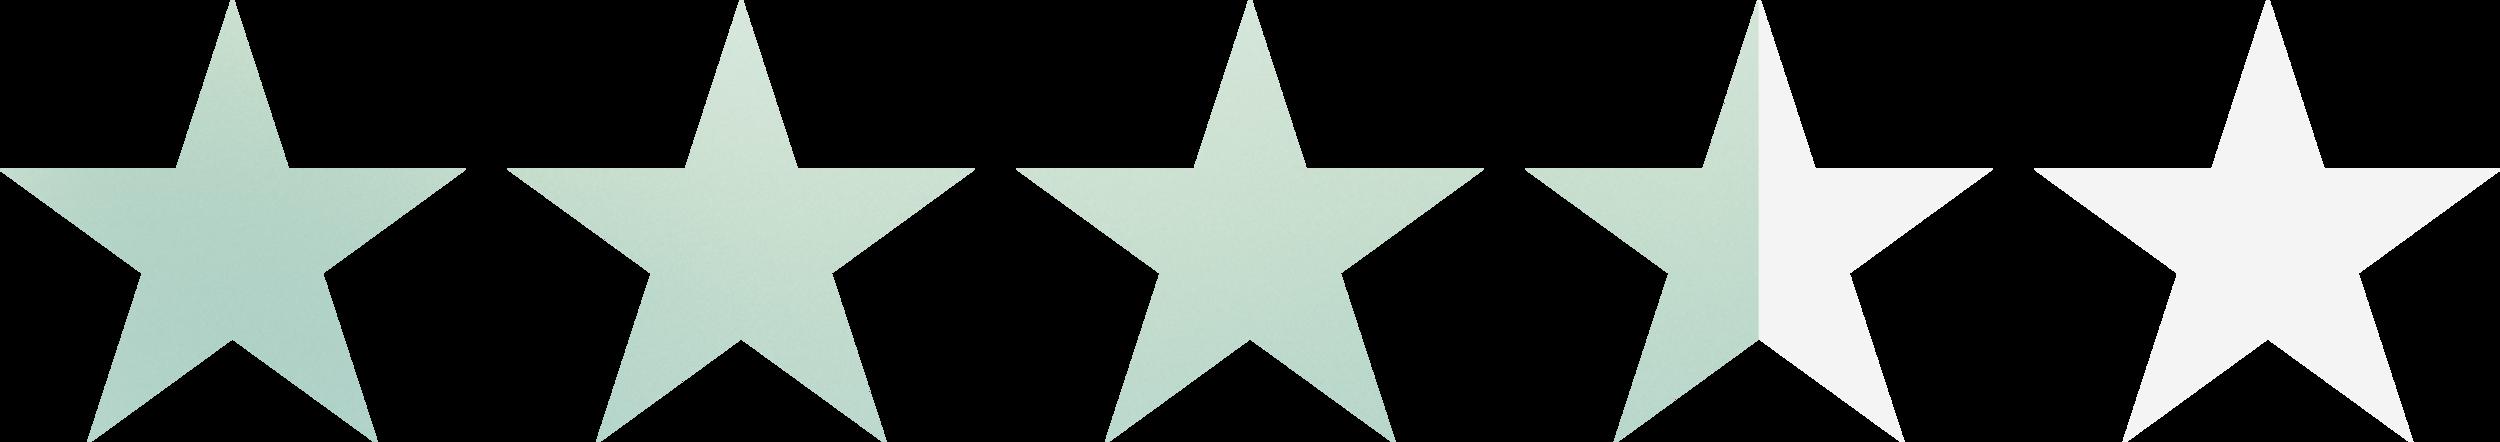 3.5stars.png